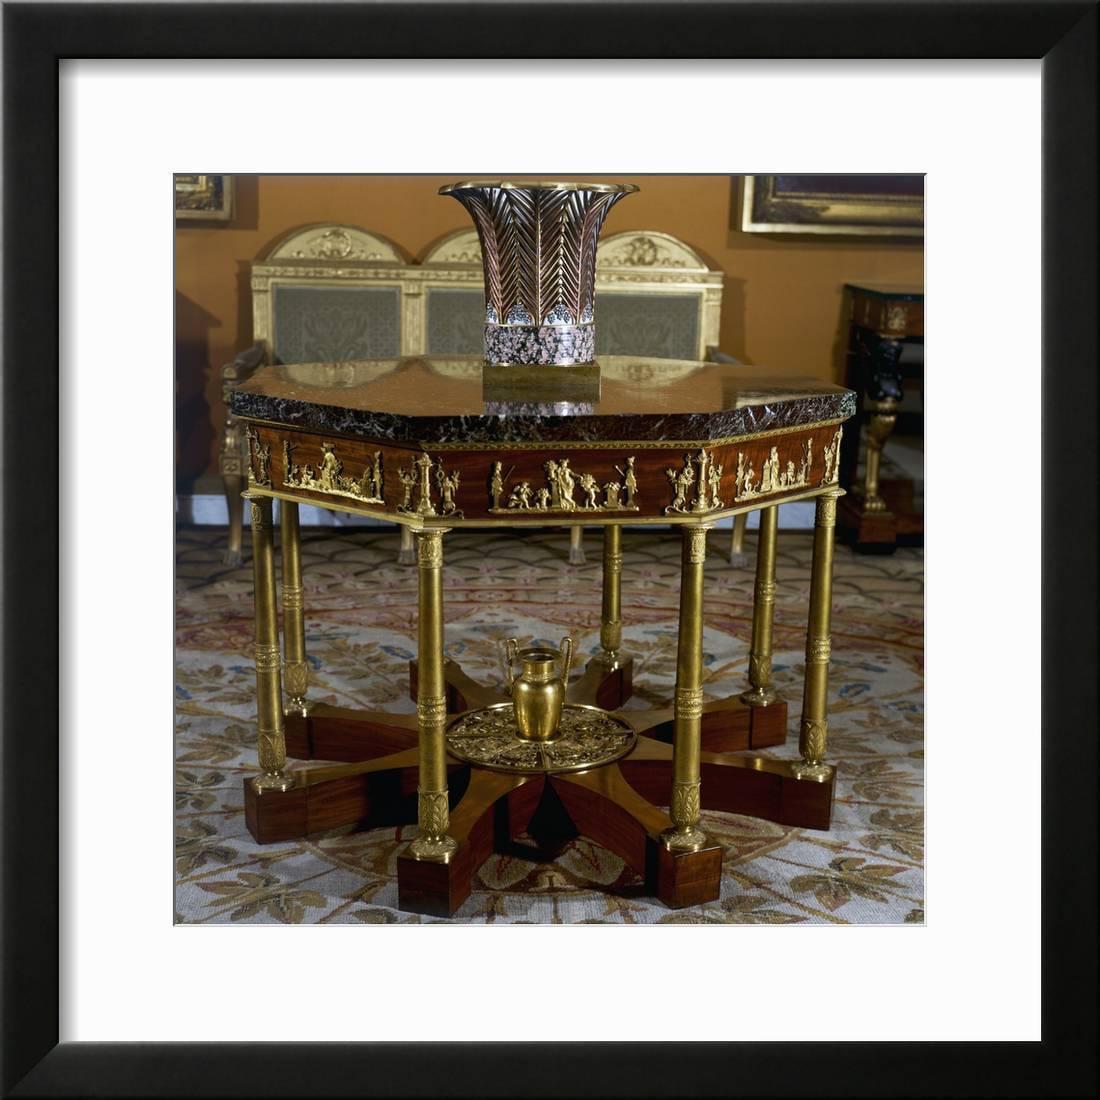 Gueridon Octagonal Shaped Mahogany Furniture Cau De Malmaison France 19th Century Framed Print Wall Art